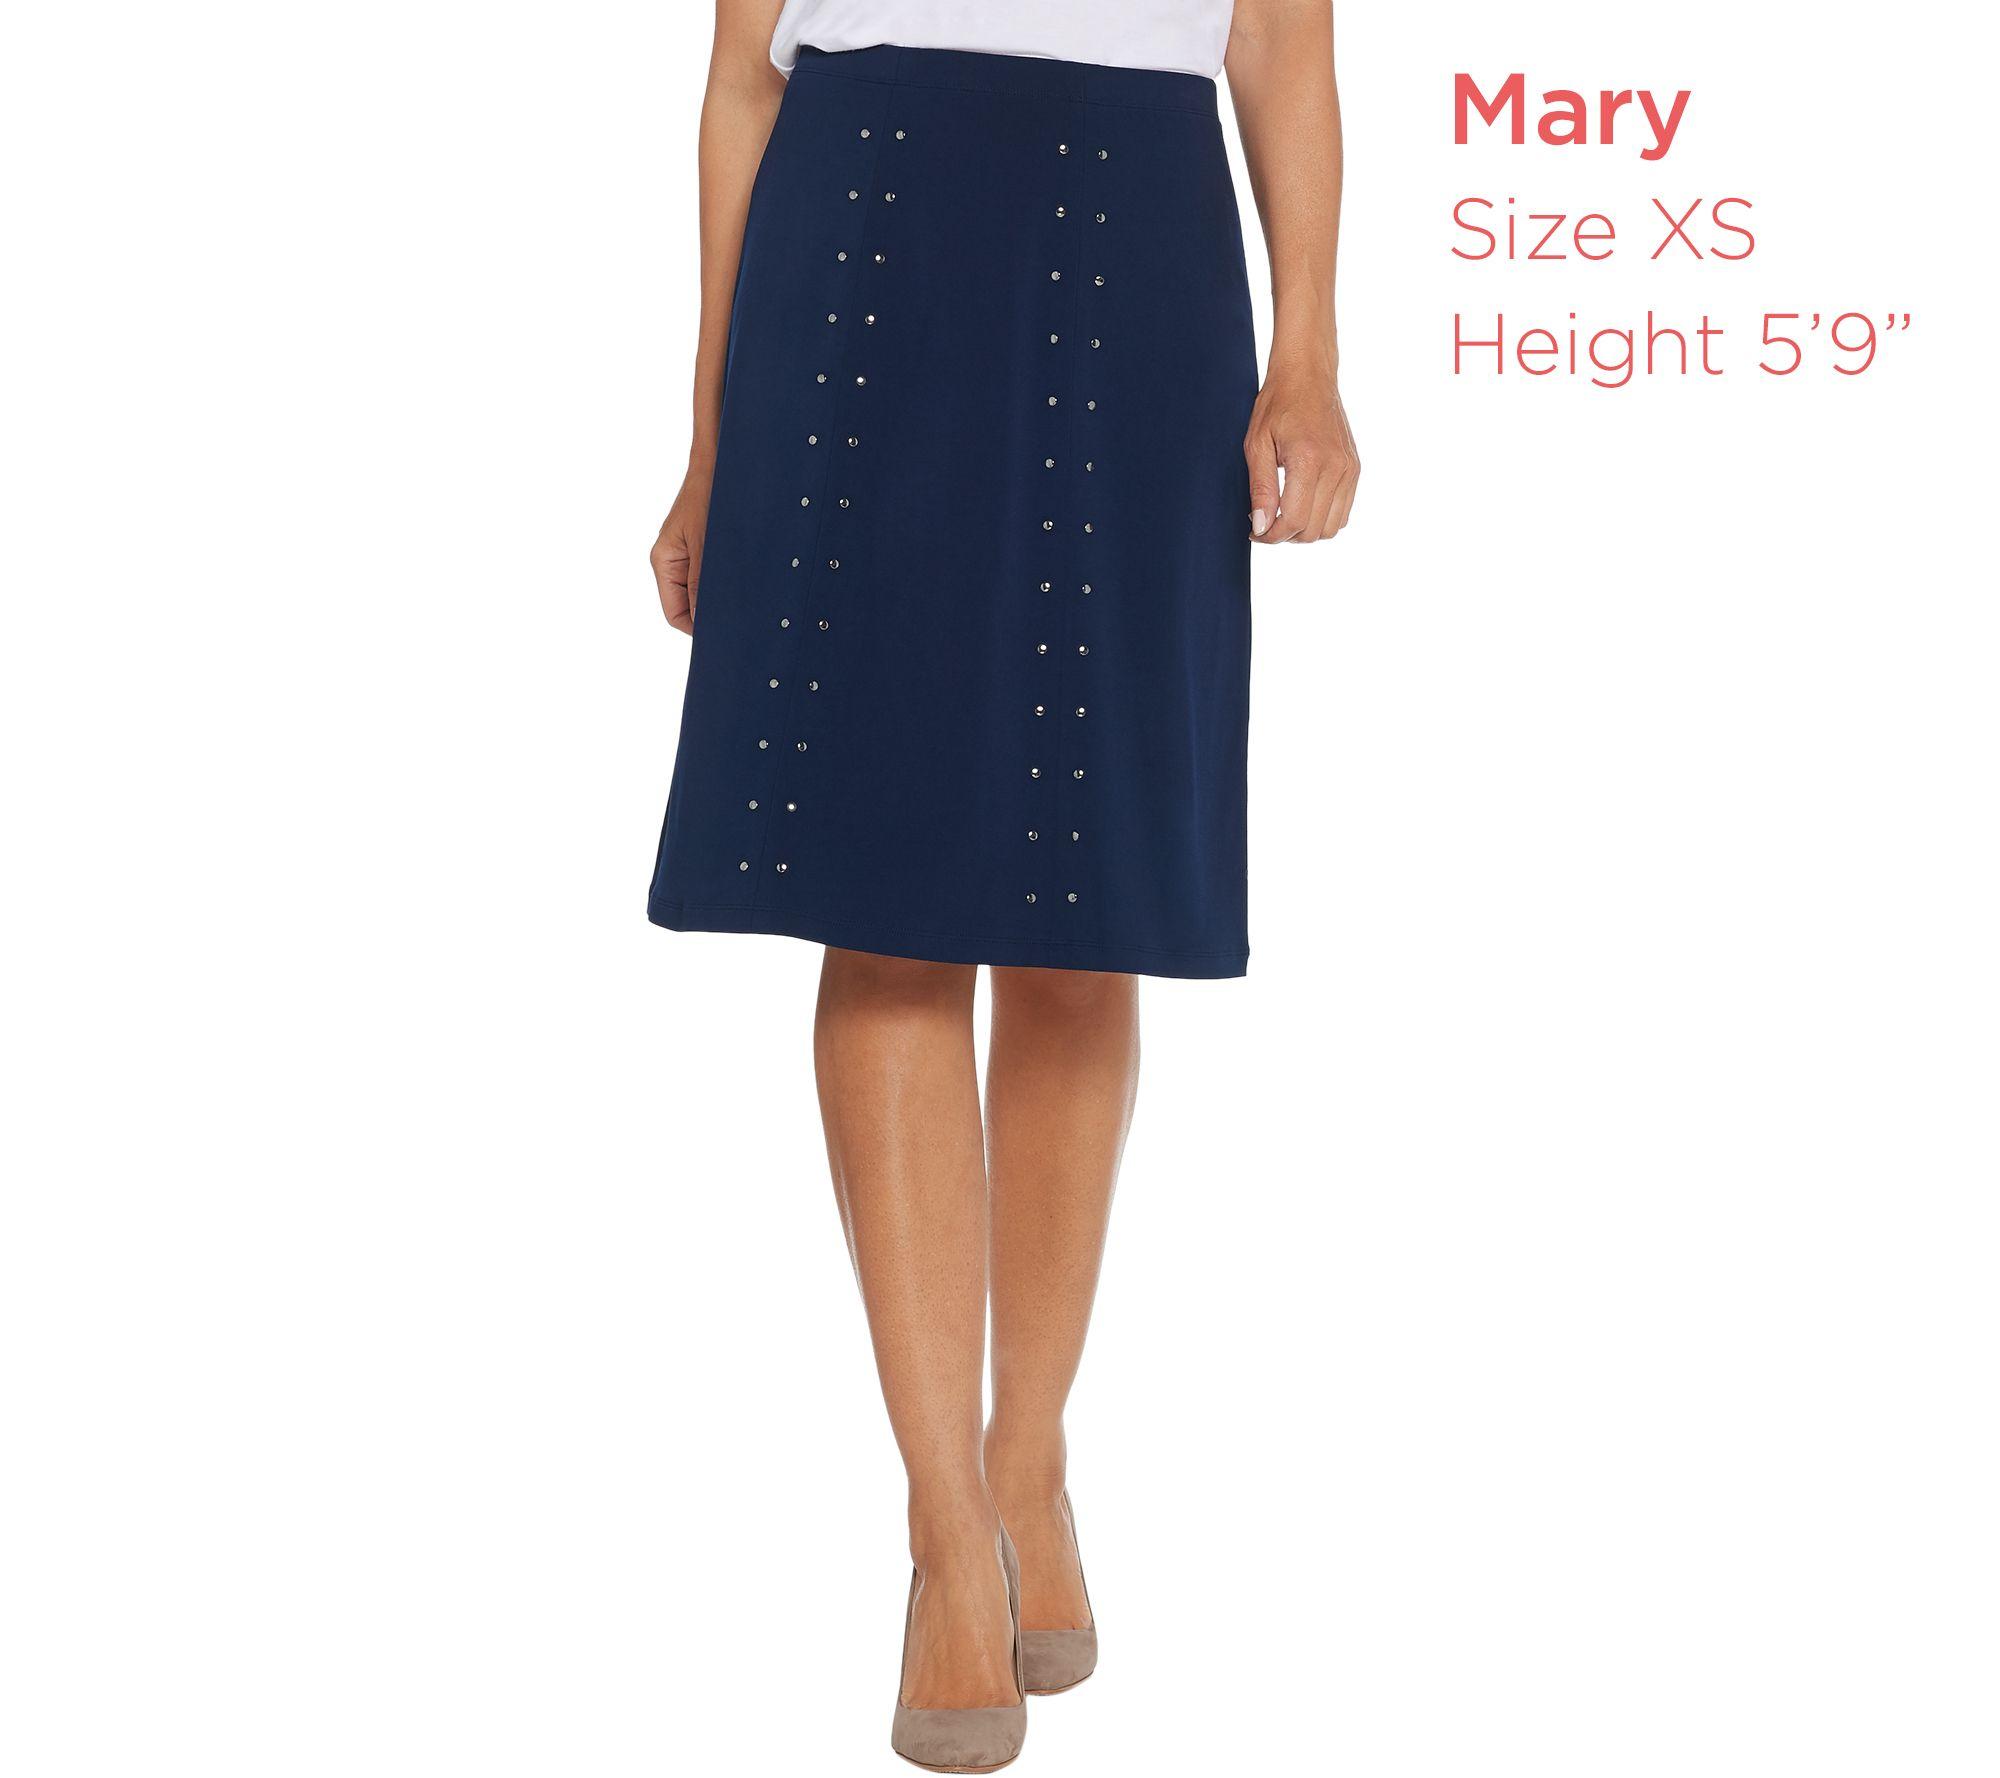 3c49624b60ef Susan Graver Liquid Knit 6-Gore Skirt with Stud Trim - Page 1 — QVC.com